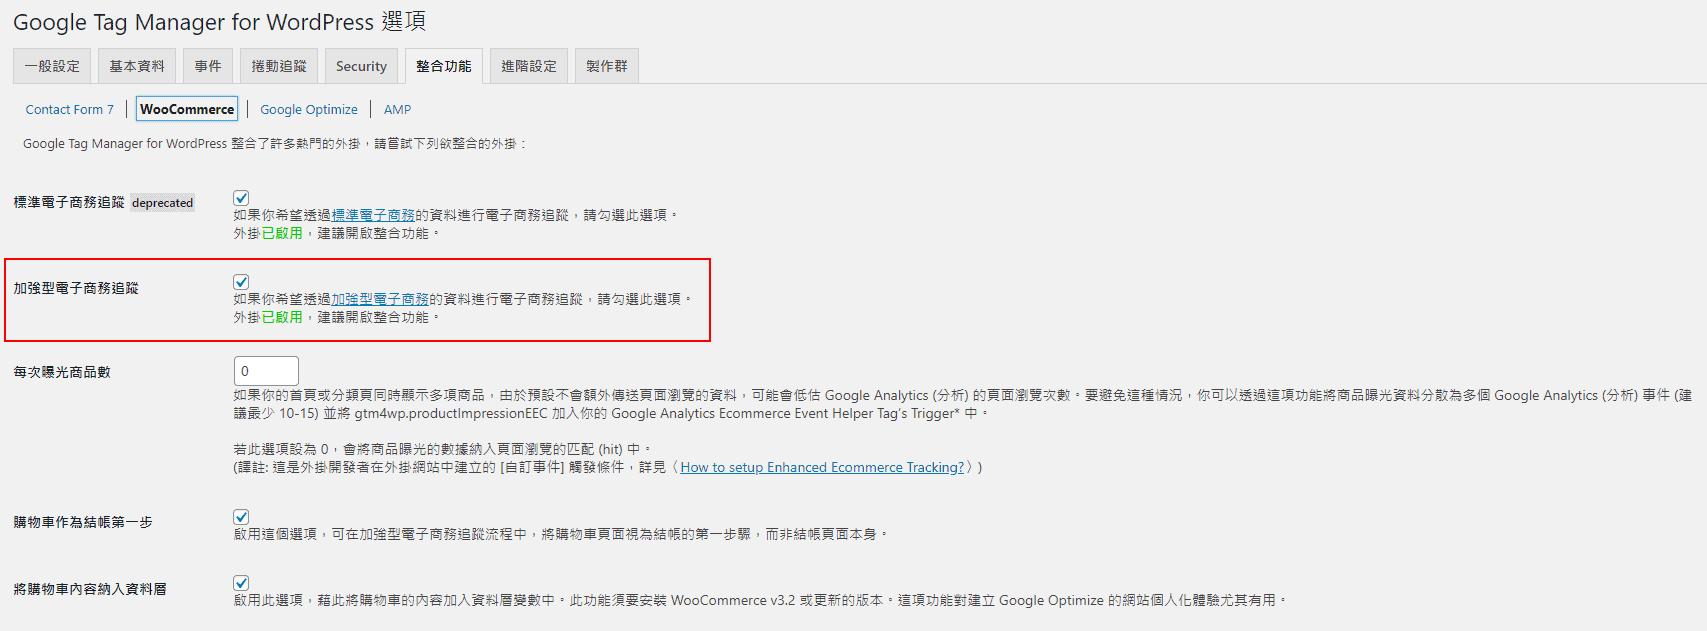 Google Tag Manager for WordPress外掛